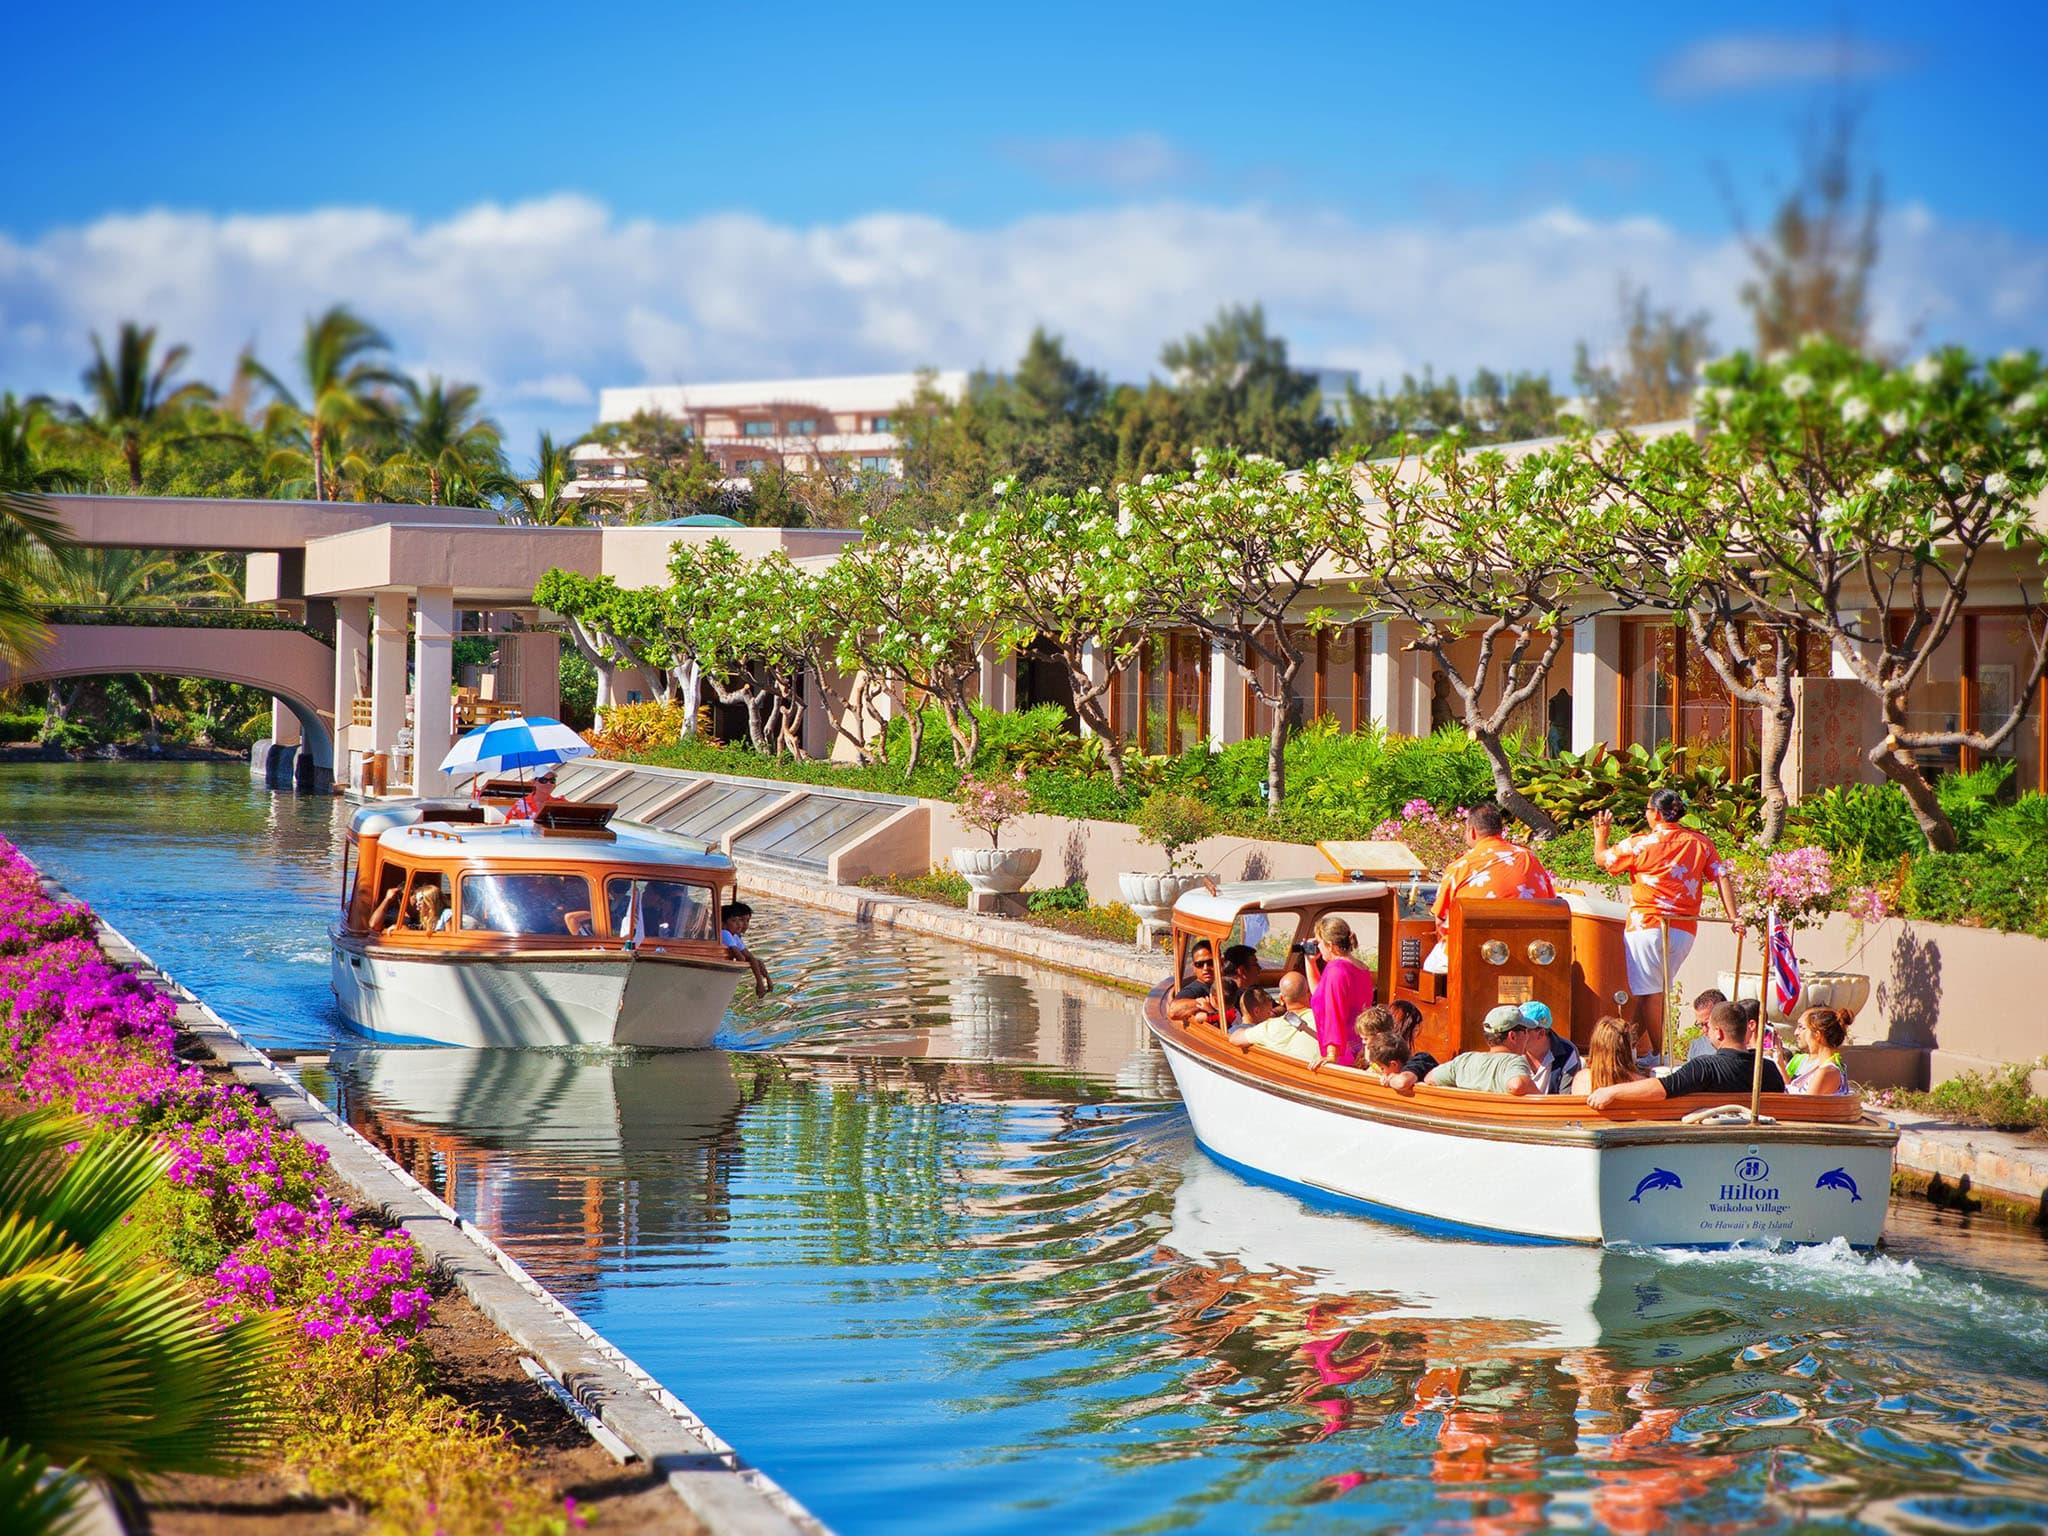 Canal boats at Hilton Waikoloa transport guests around the property. Photo courtesy Hilton Waikoloa Village.